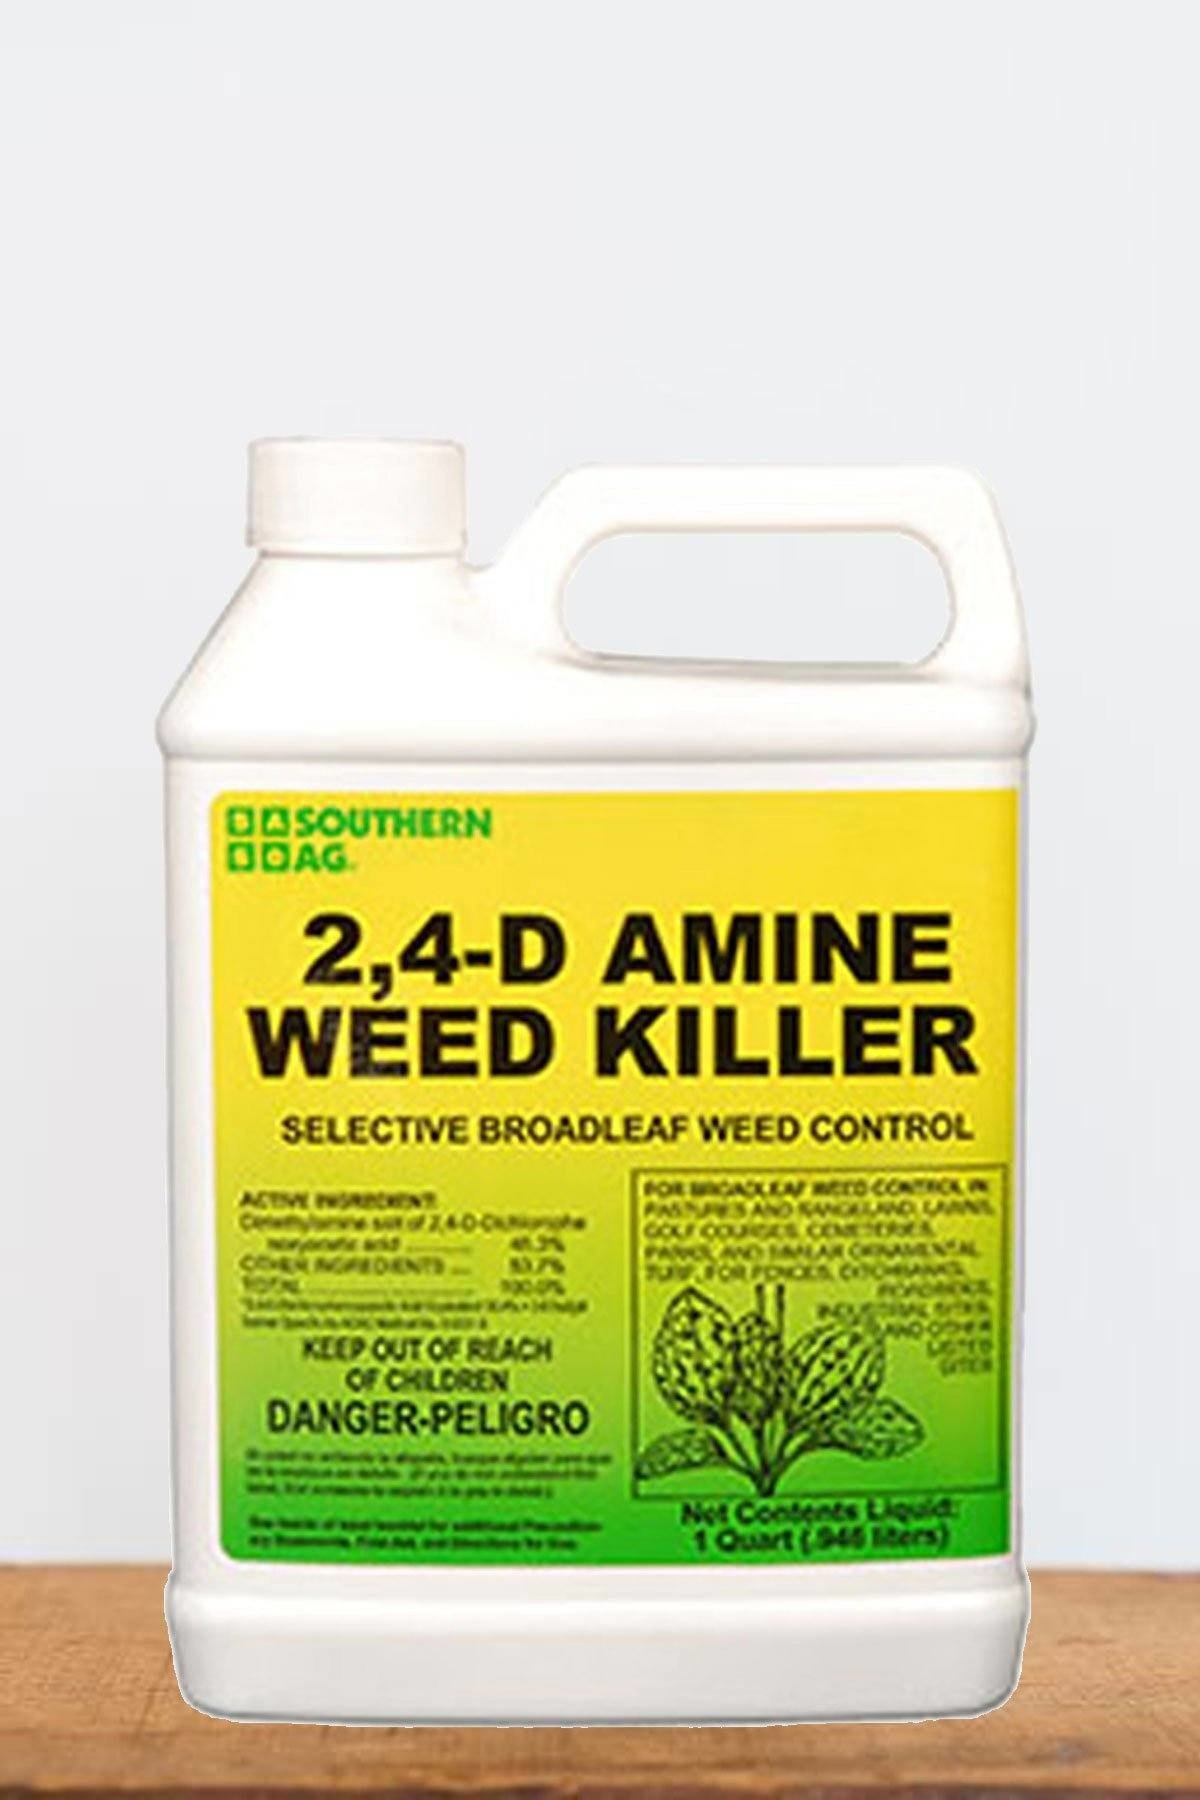 Southern Ag 2, 4 - D Amine Weed Killer, 1 Quart